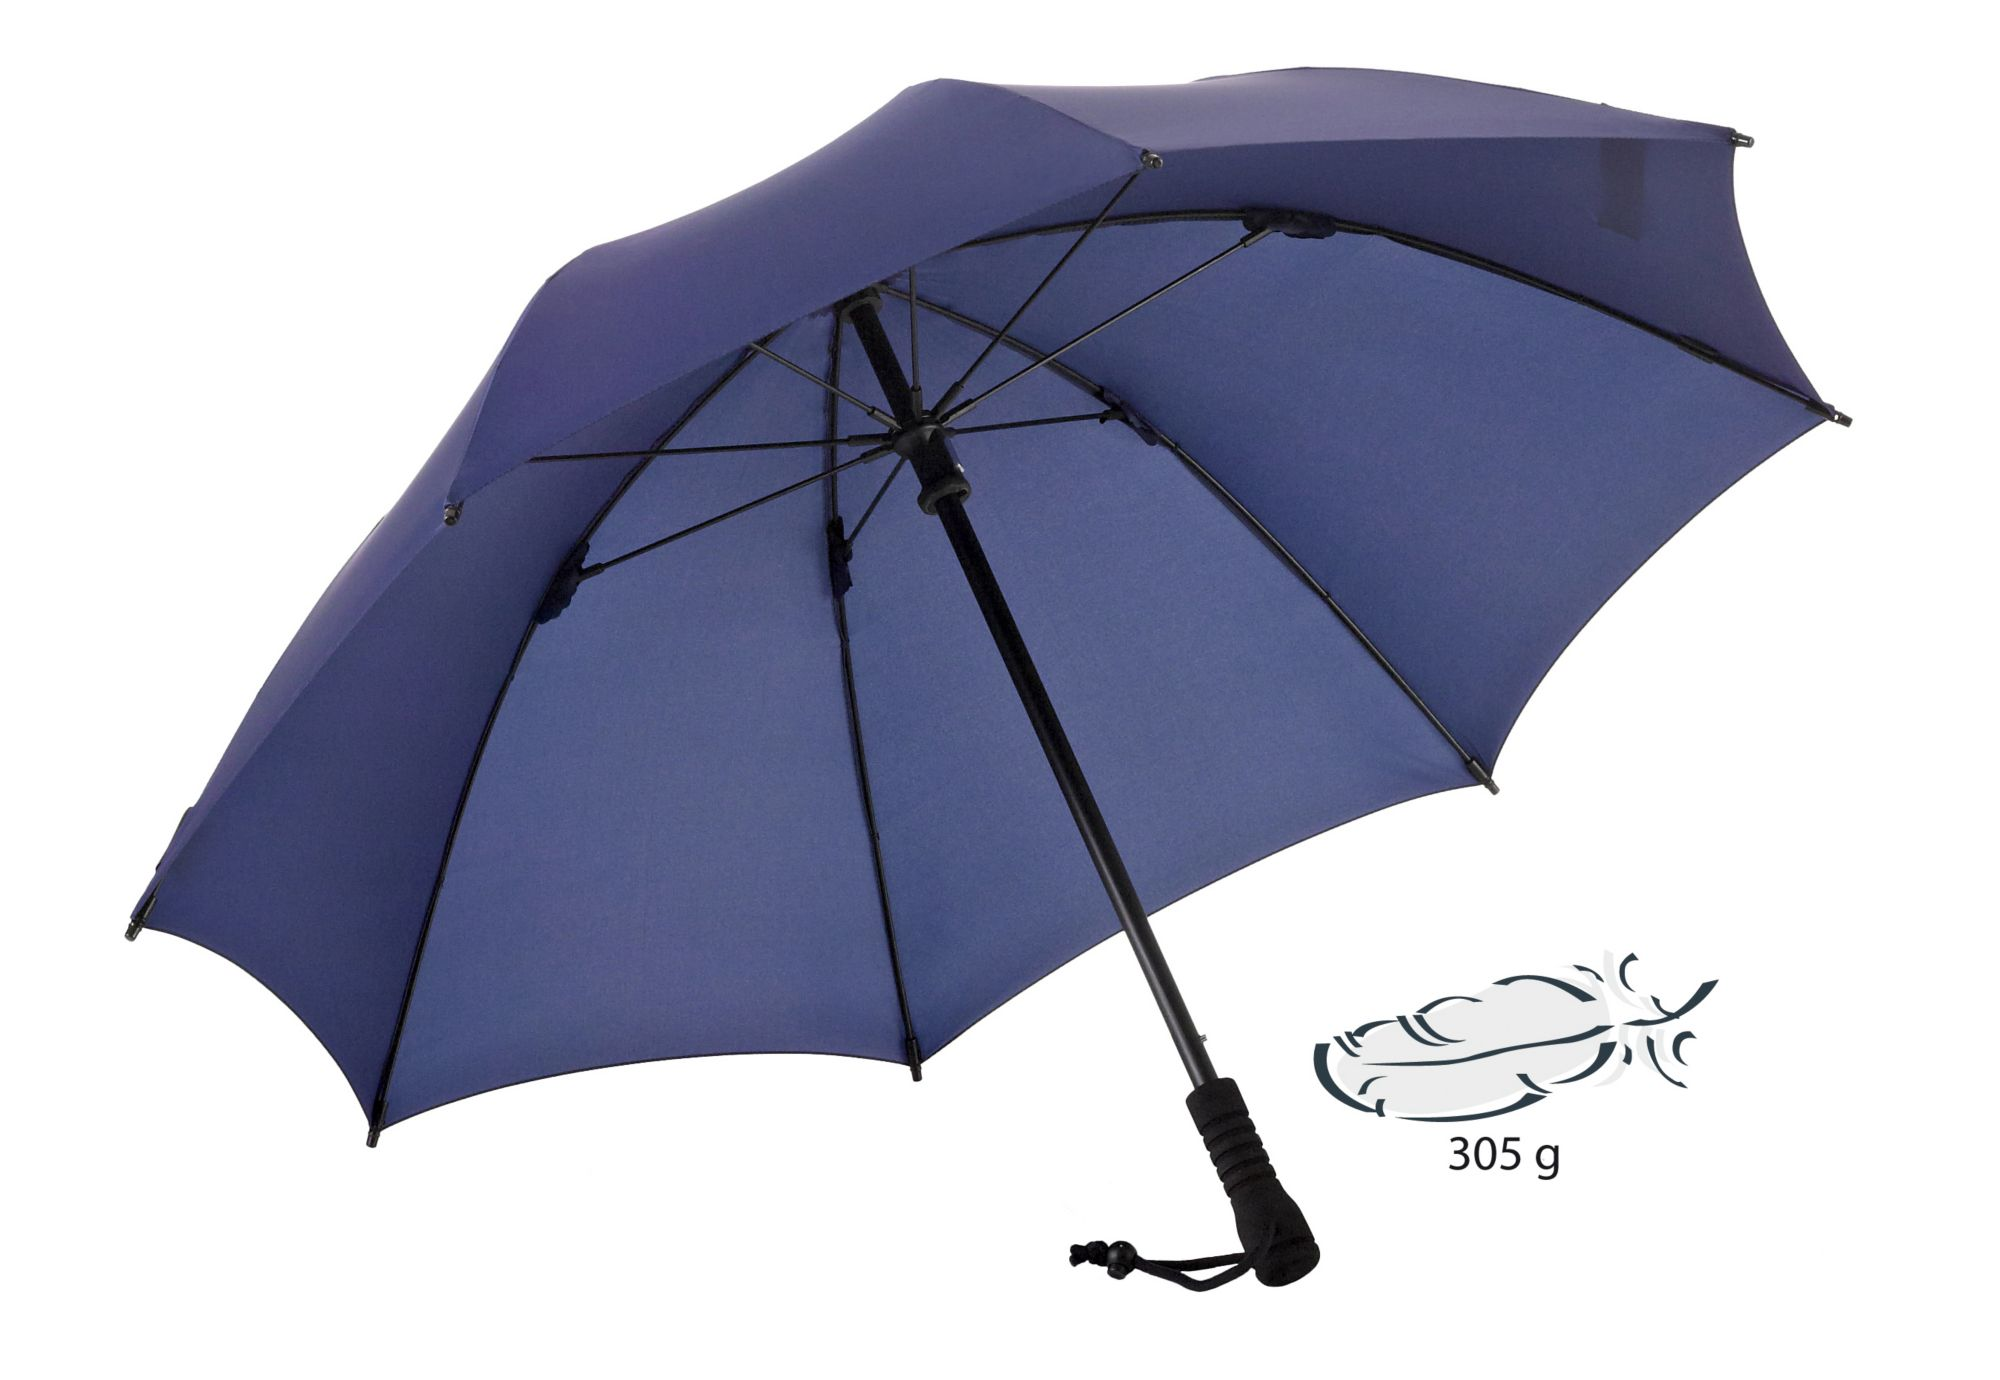 EUROSCHIRM® Euroschirm® Regenschirm, »Swing Trekkingschirm«